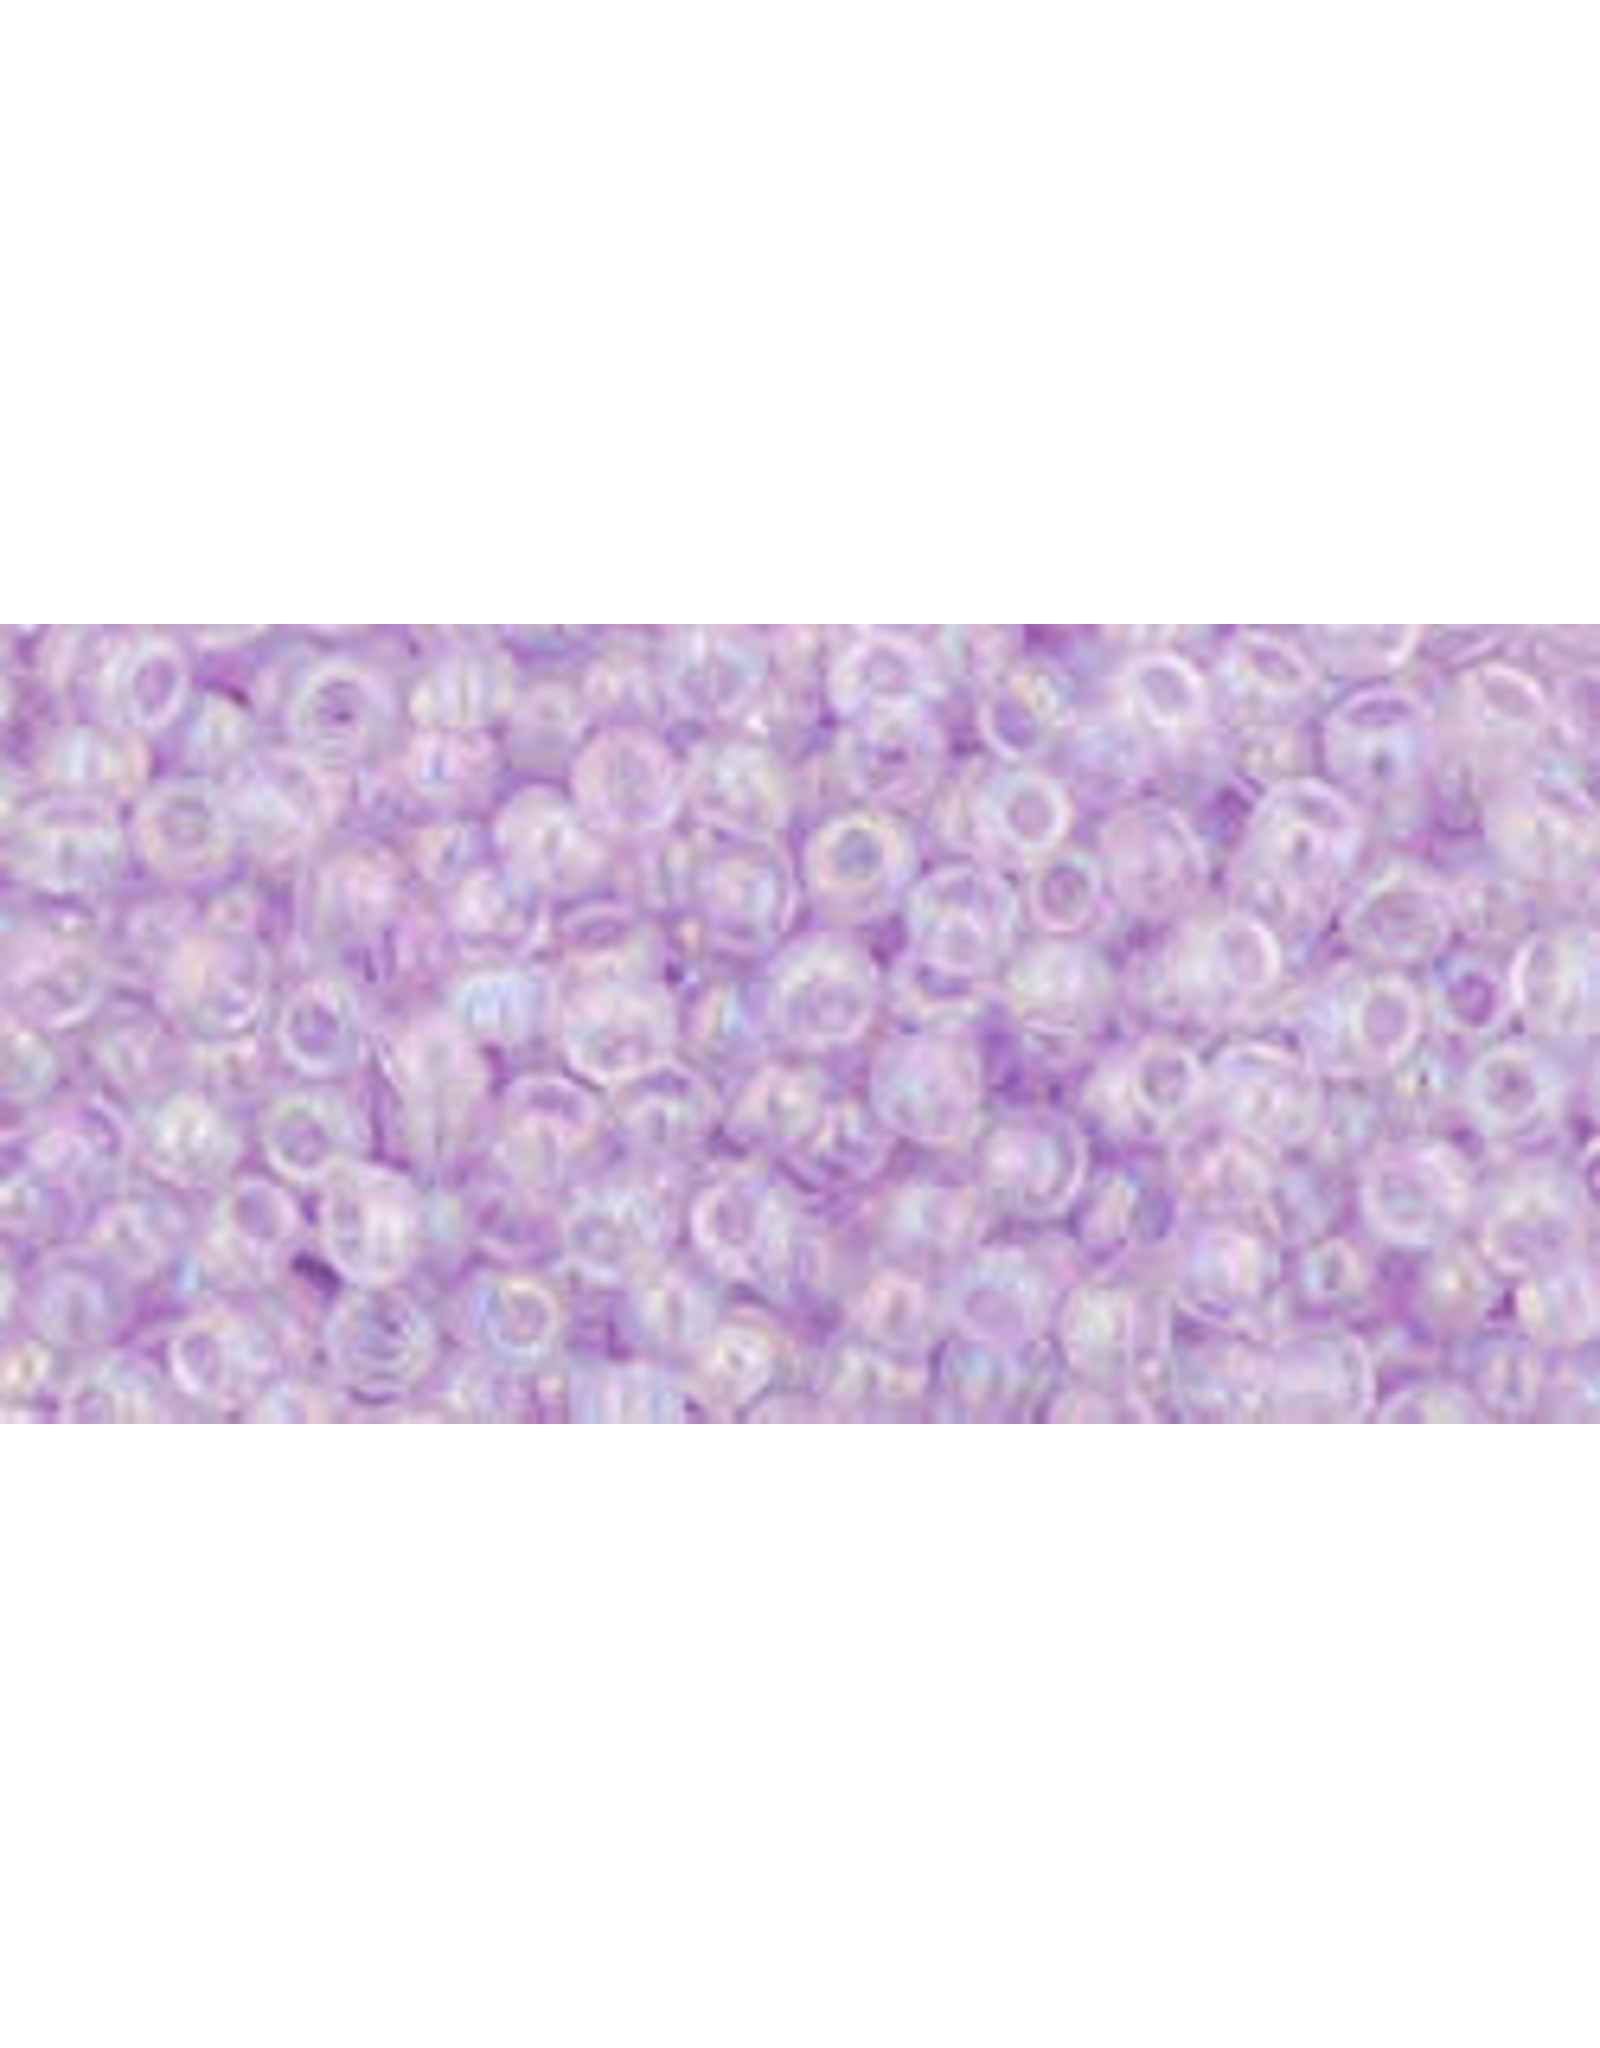 Toho 477dB 11 Toho Round 40g Transparent Foxglove Purple AB